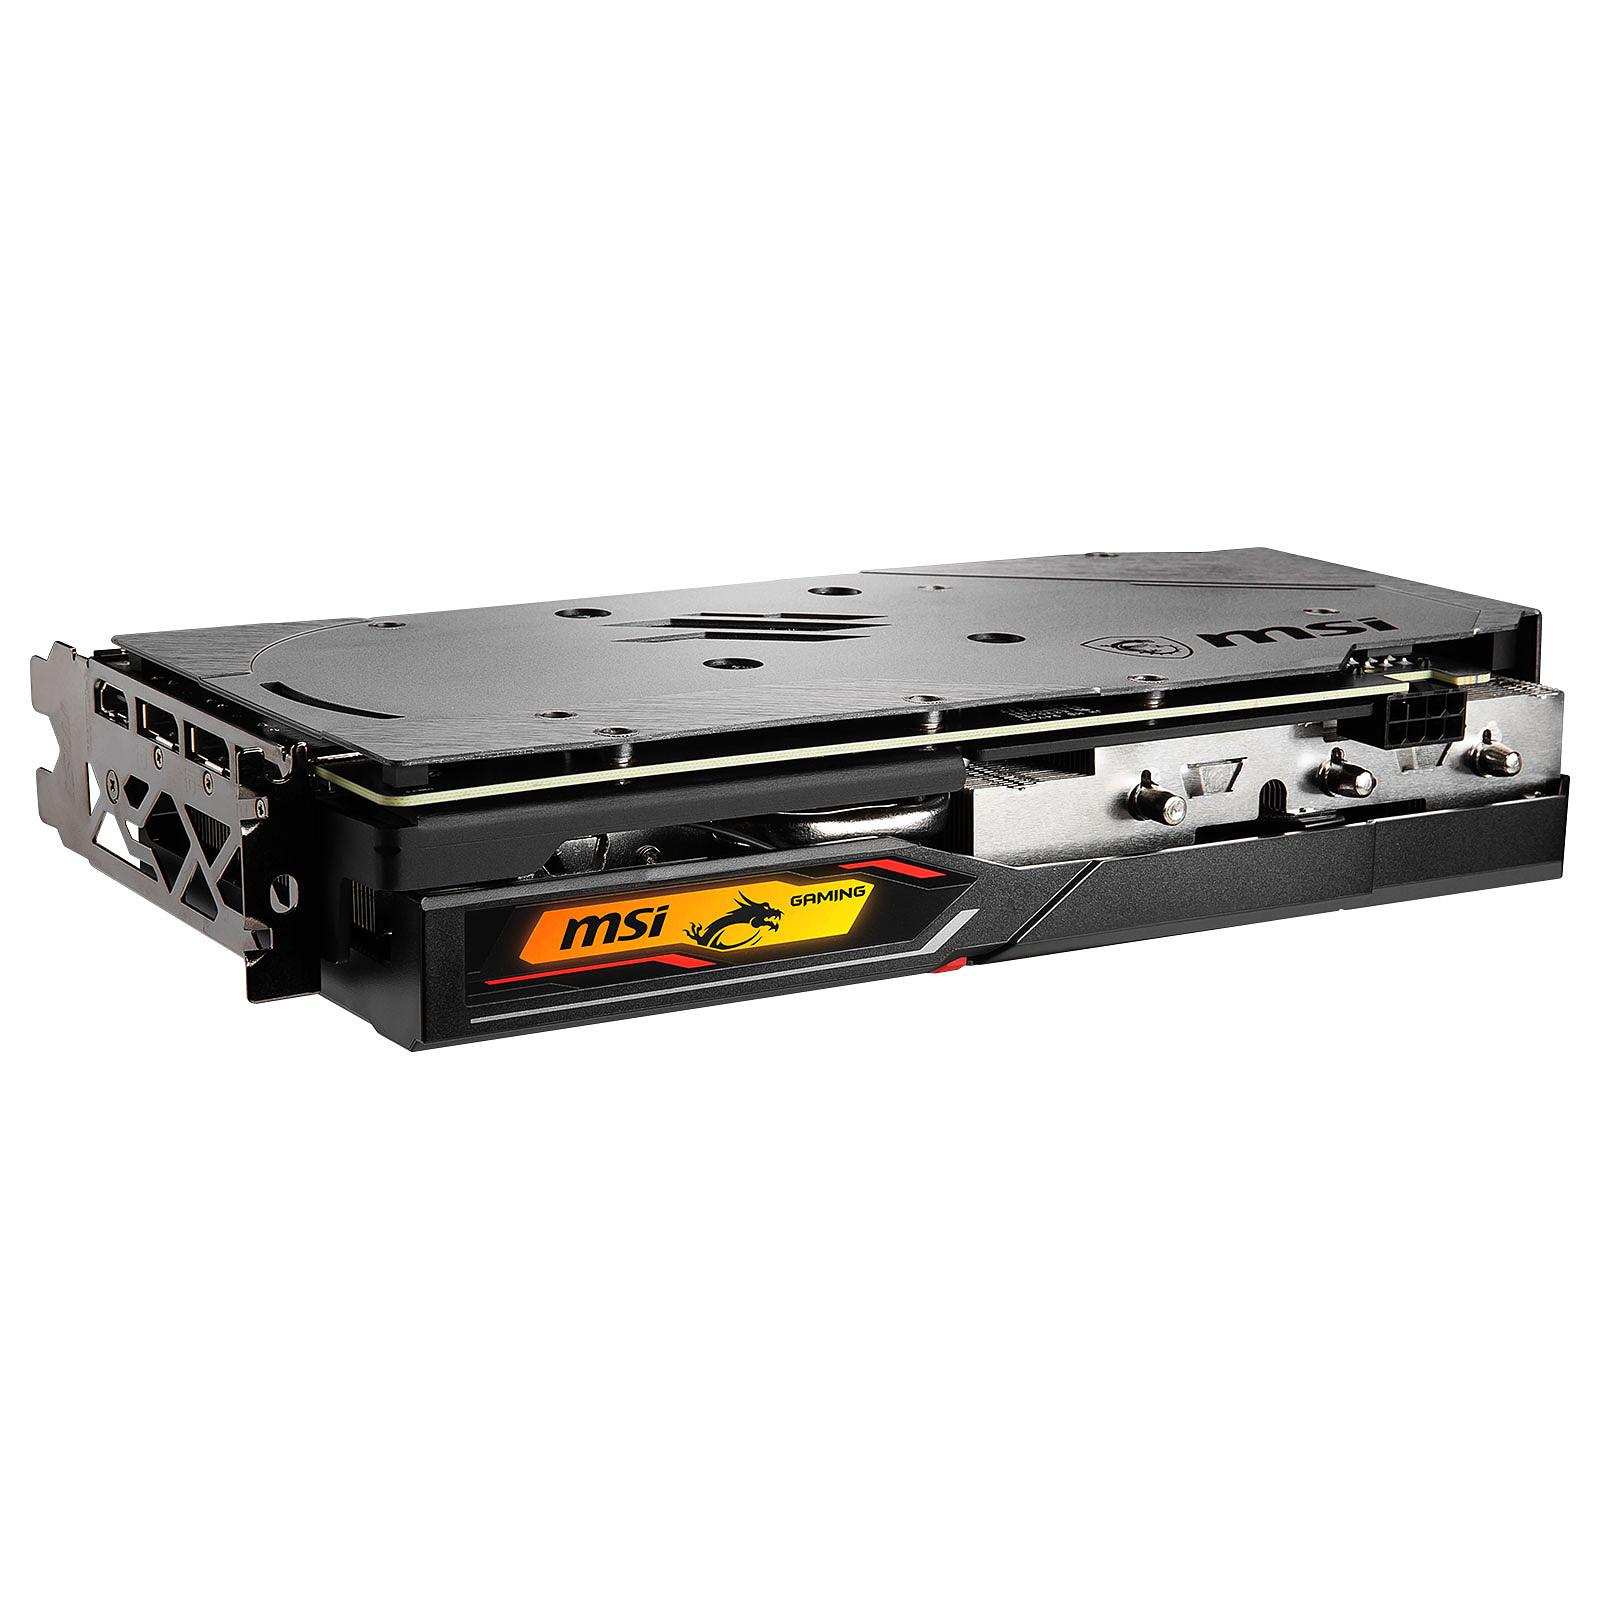 Radeon RX 5500 XT GAMING X 8G (912-V382-001) - Achat / Vente Carte graphique sur Picata.fr - 2